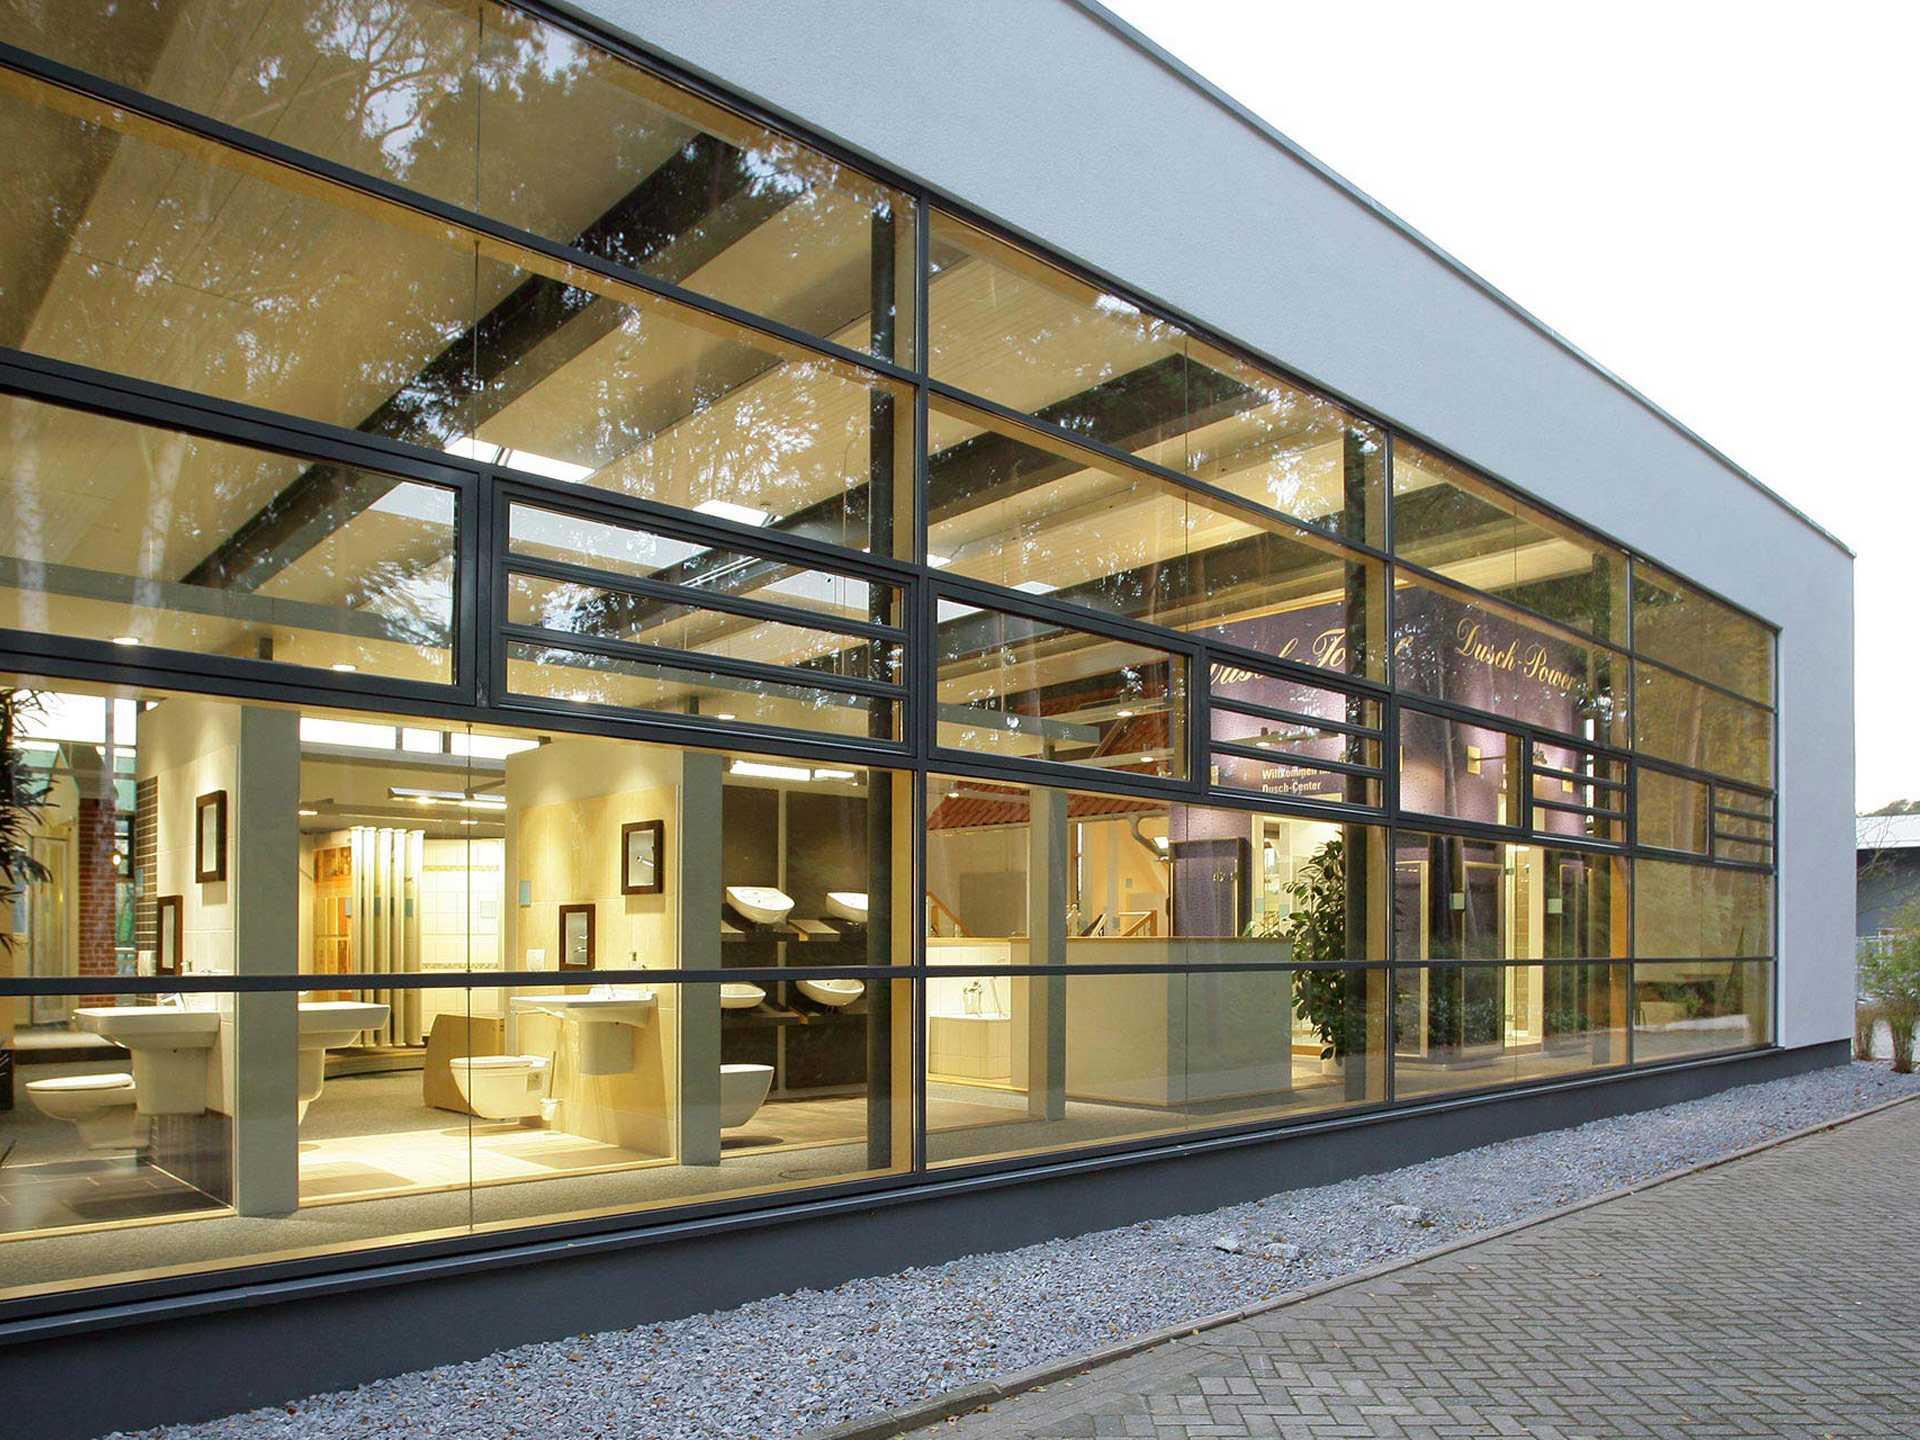 hausbau geplant h user grundrisse preise anbieter. Black Bedroom Furniture Sets. Home Design Ideas